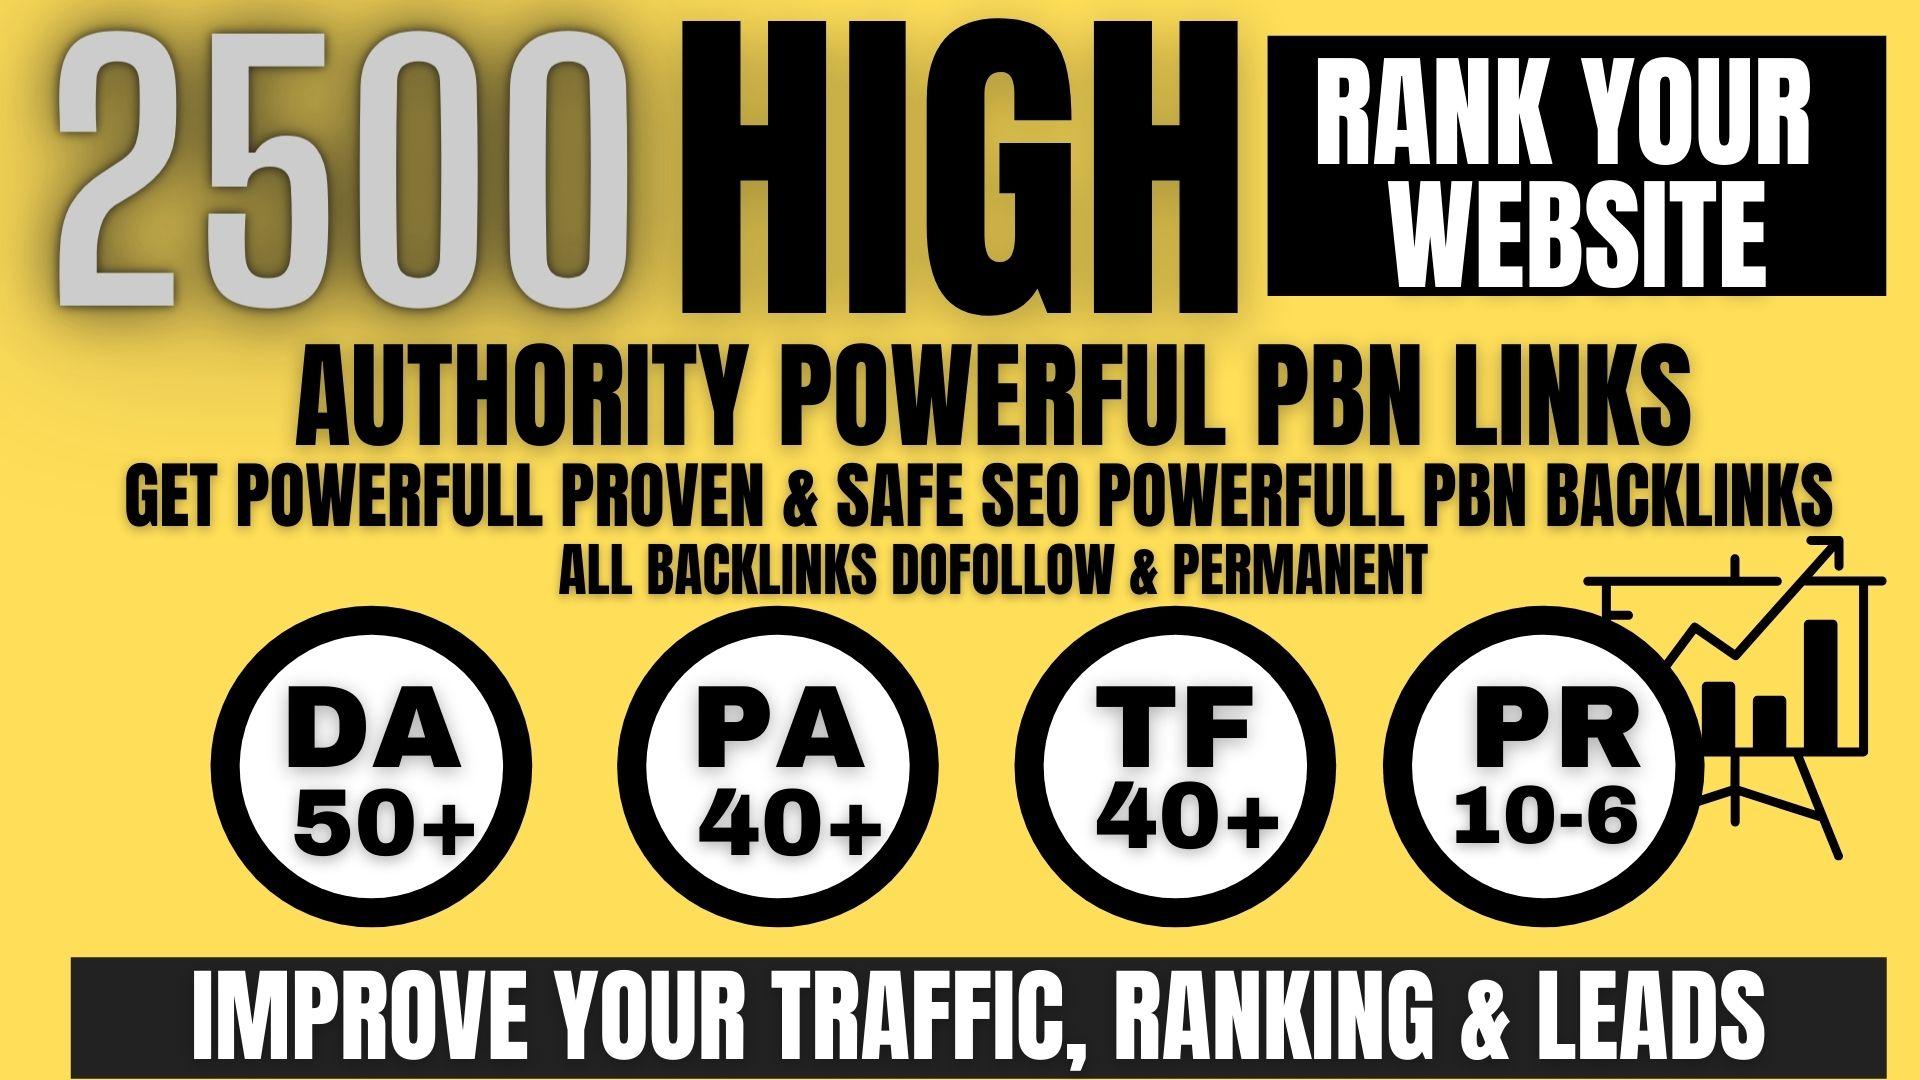 get 2500+permanent Pbn links DA50+PA40+PR6+homepage web 2.0 with do-follow unique site